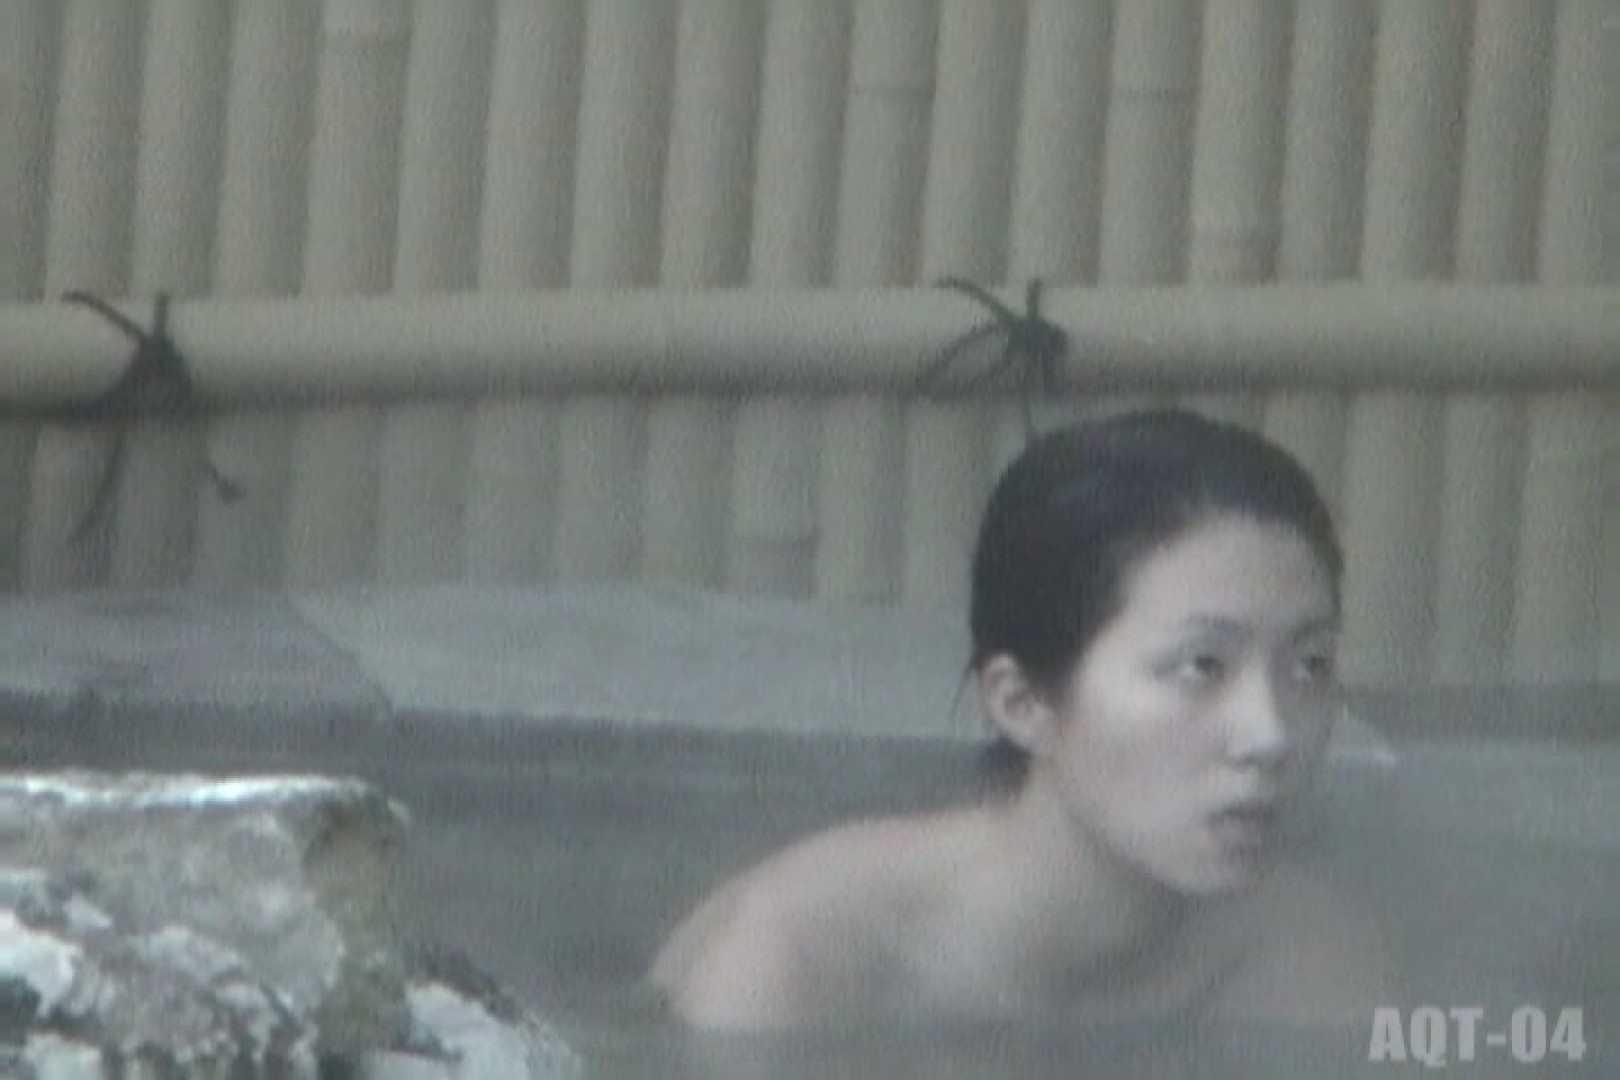 Aquaな露天風呂Vol.741 盗撮シリーズ   露天風呂編  111PIX 83